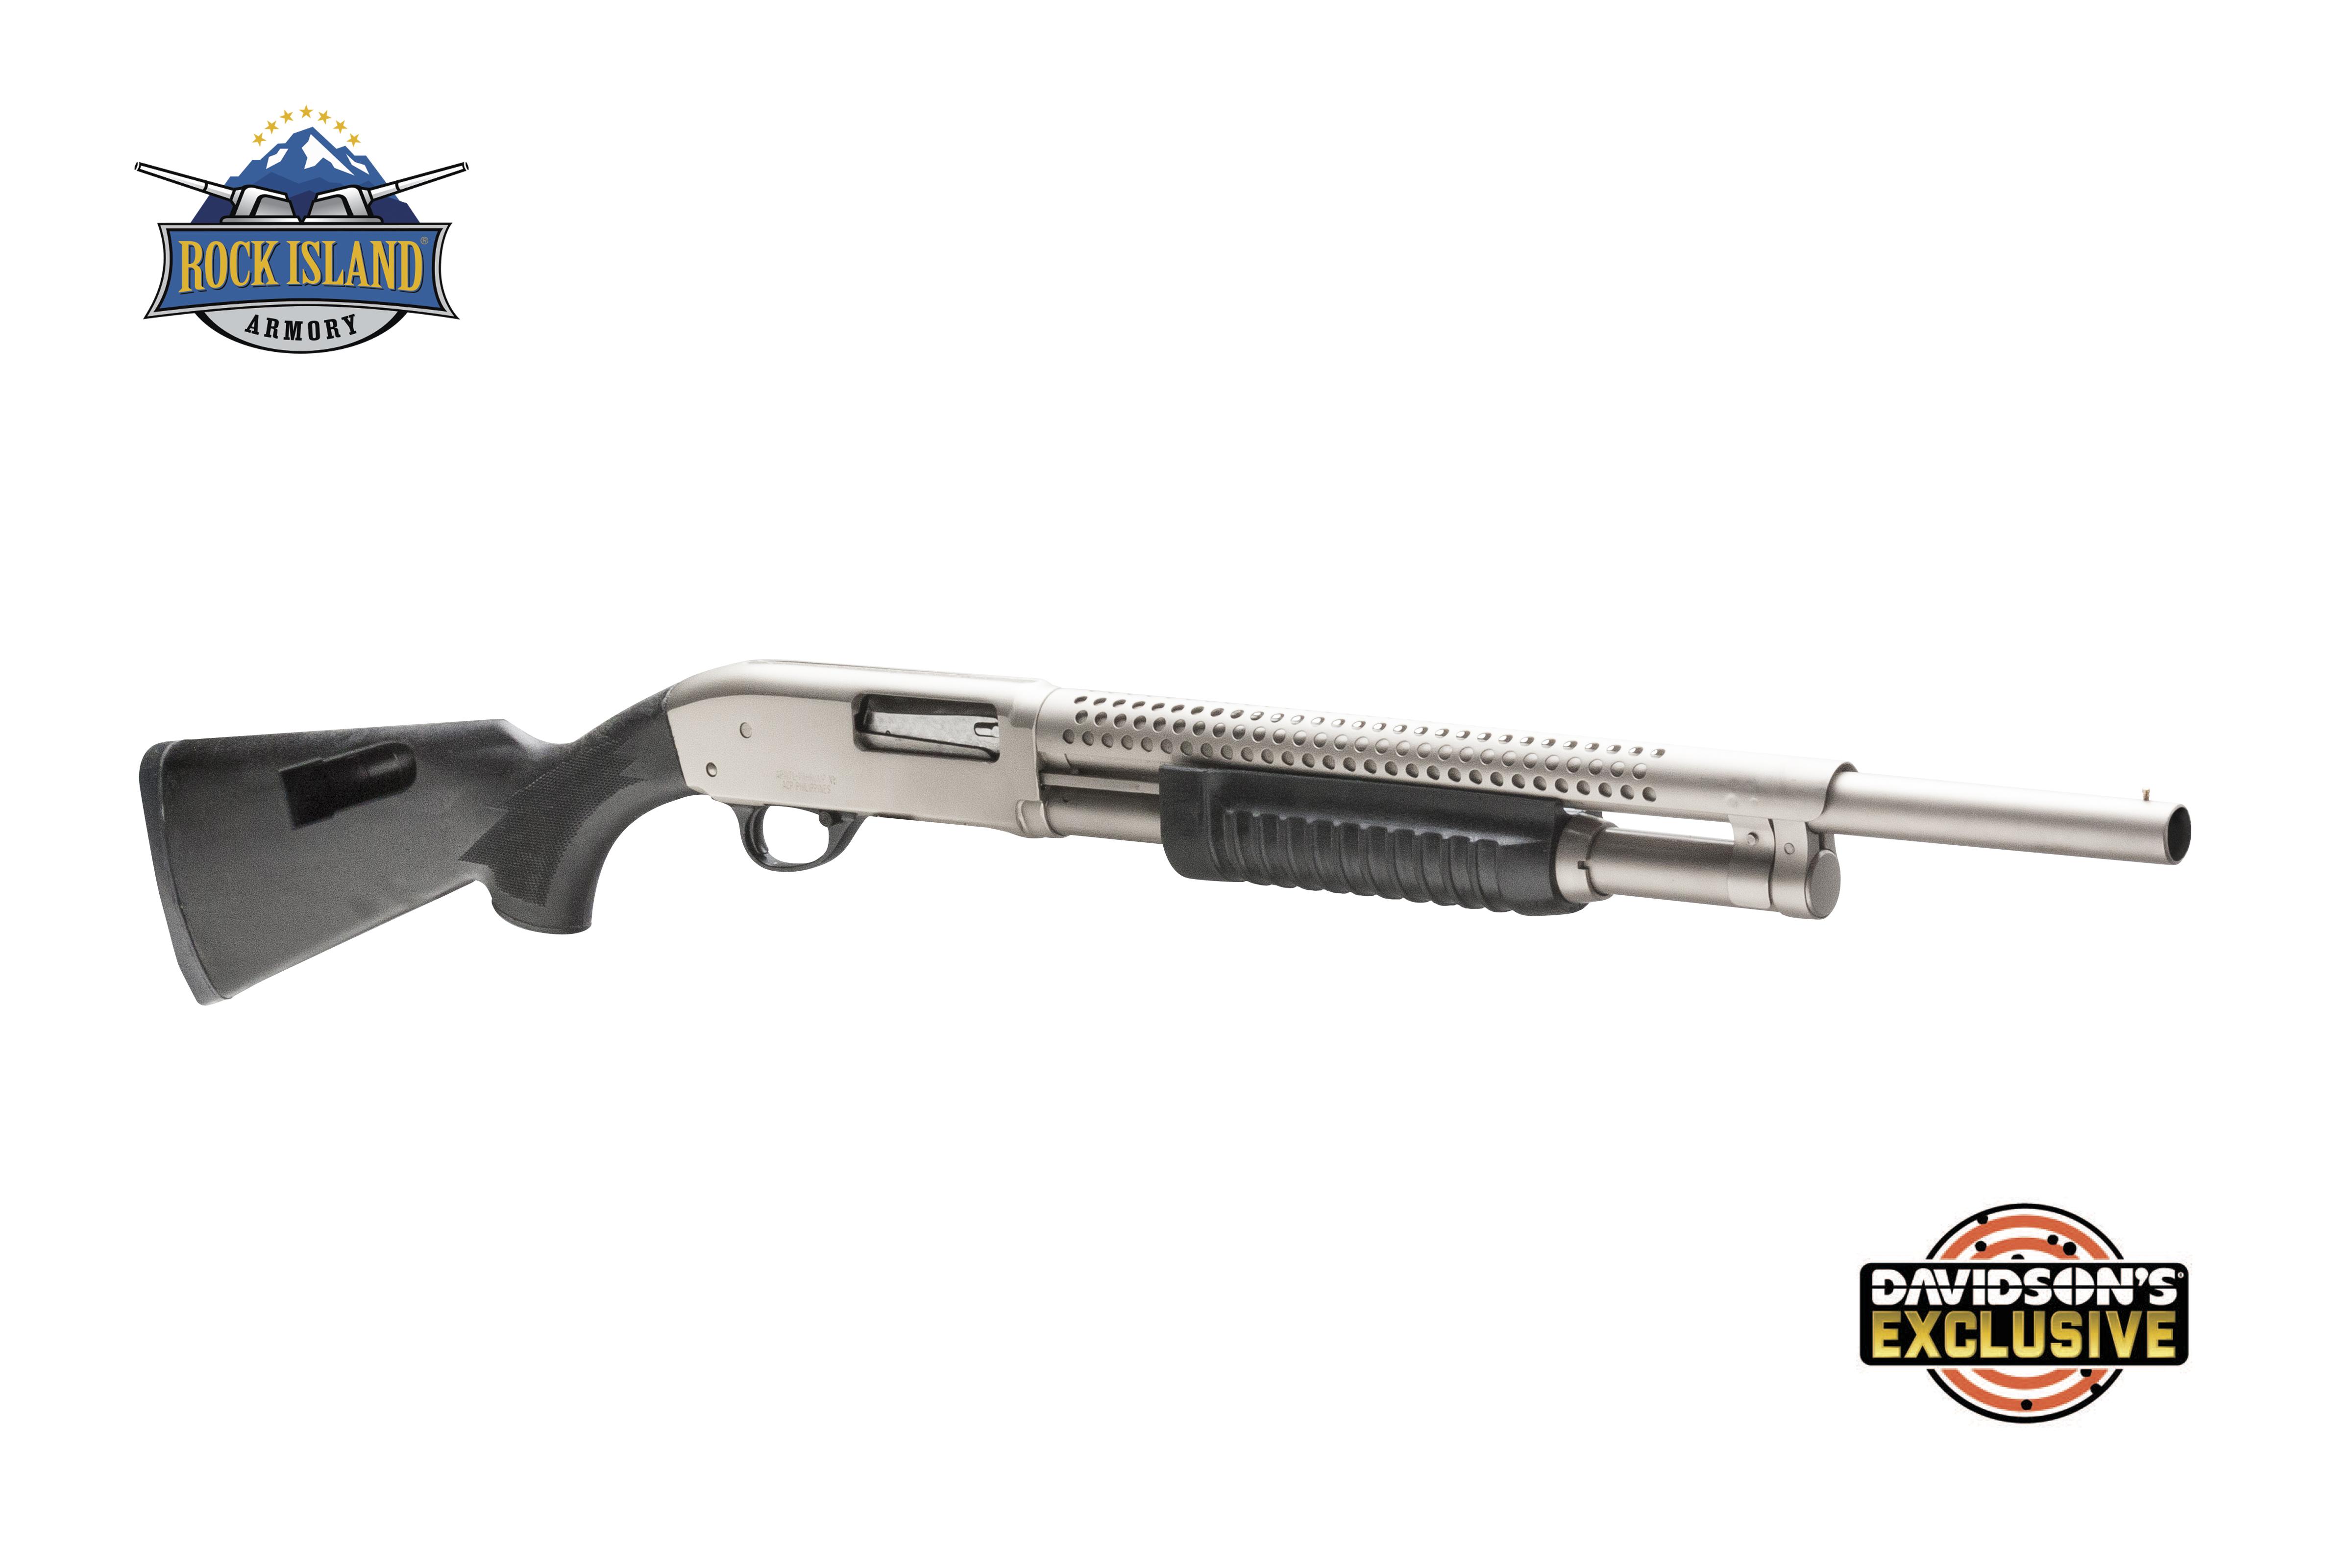 Product Spotlight: Davidson's Exclusive Rock Island Armory M5